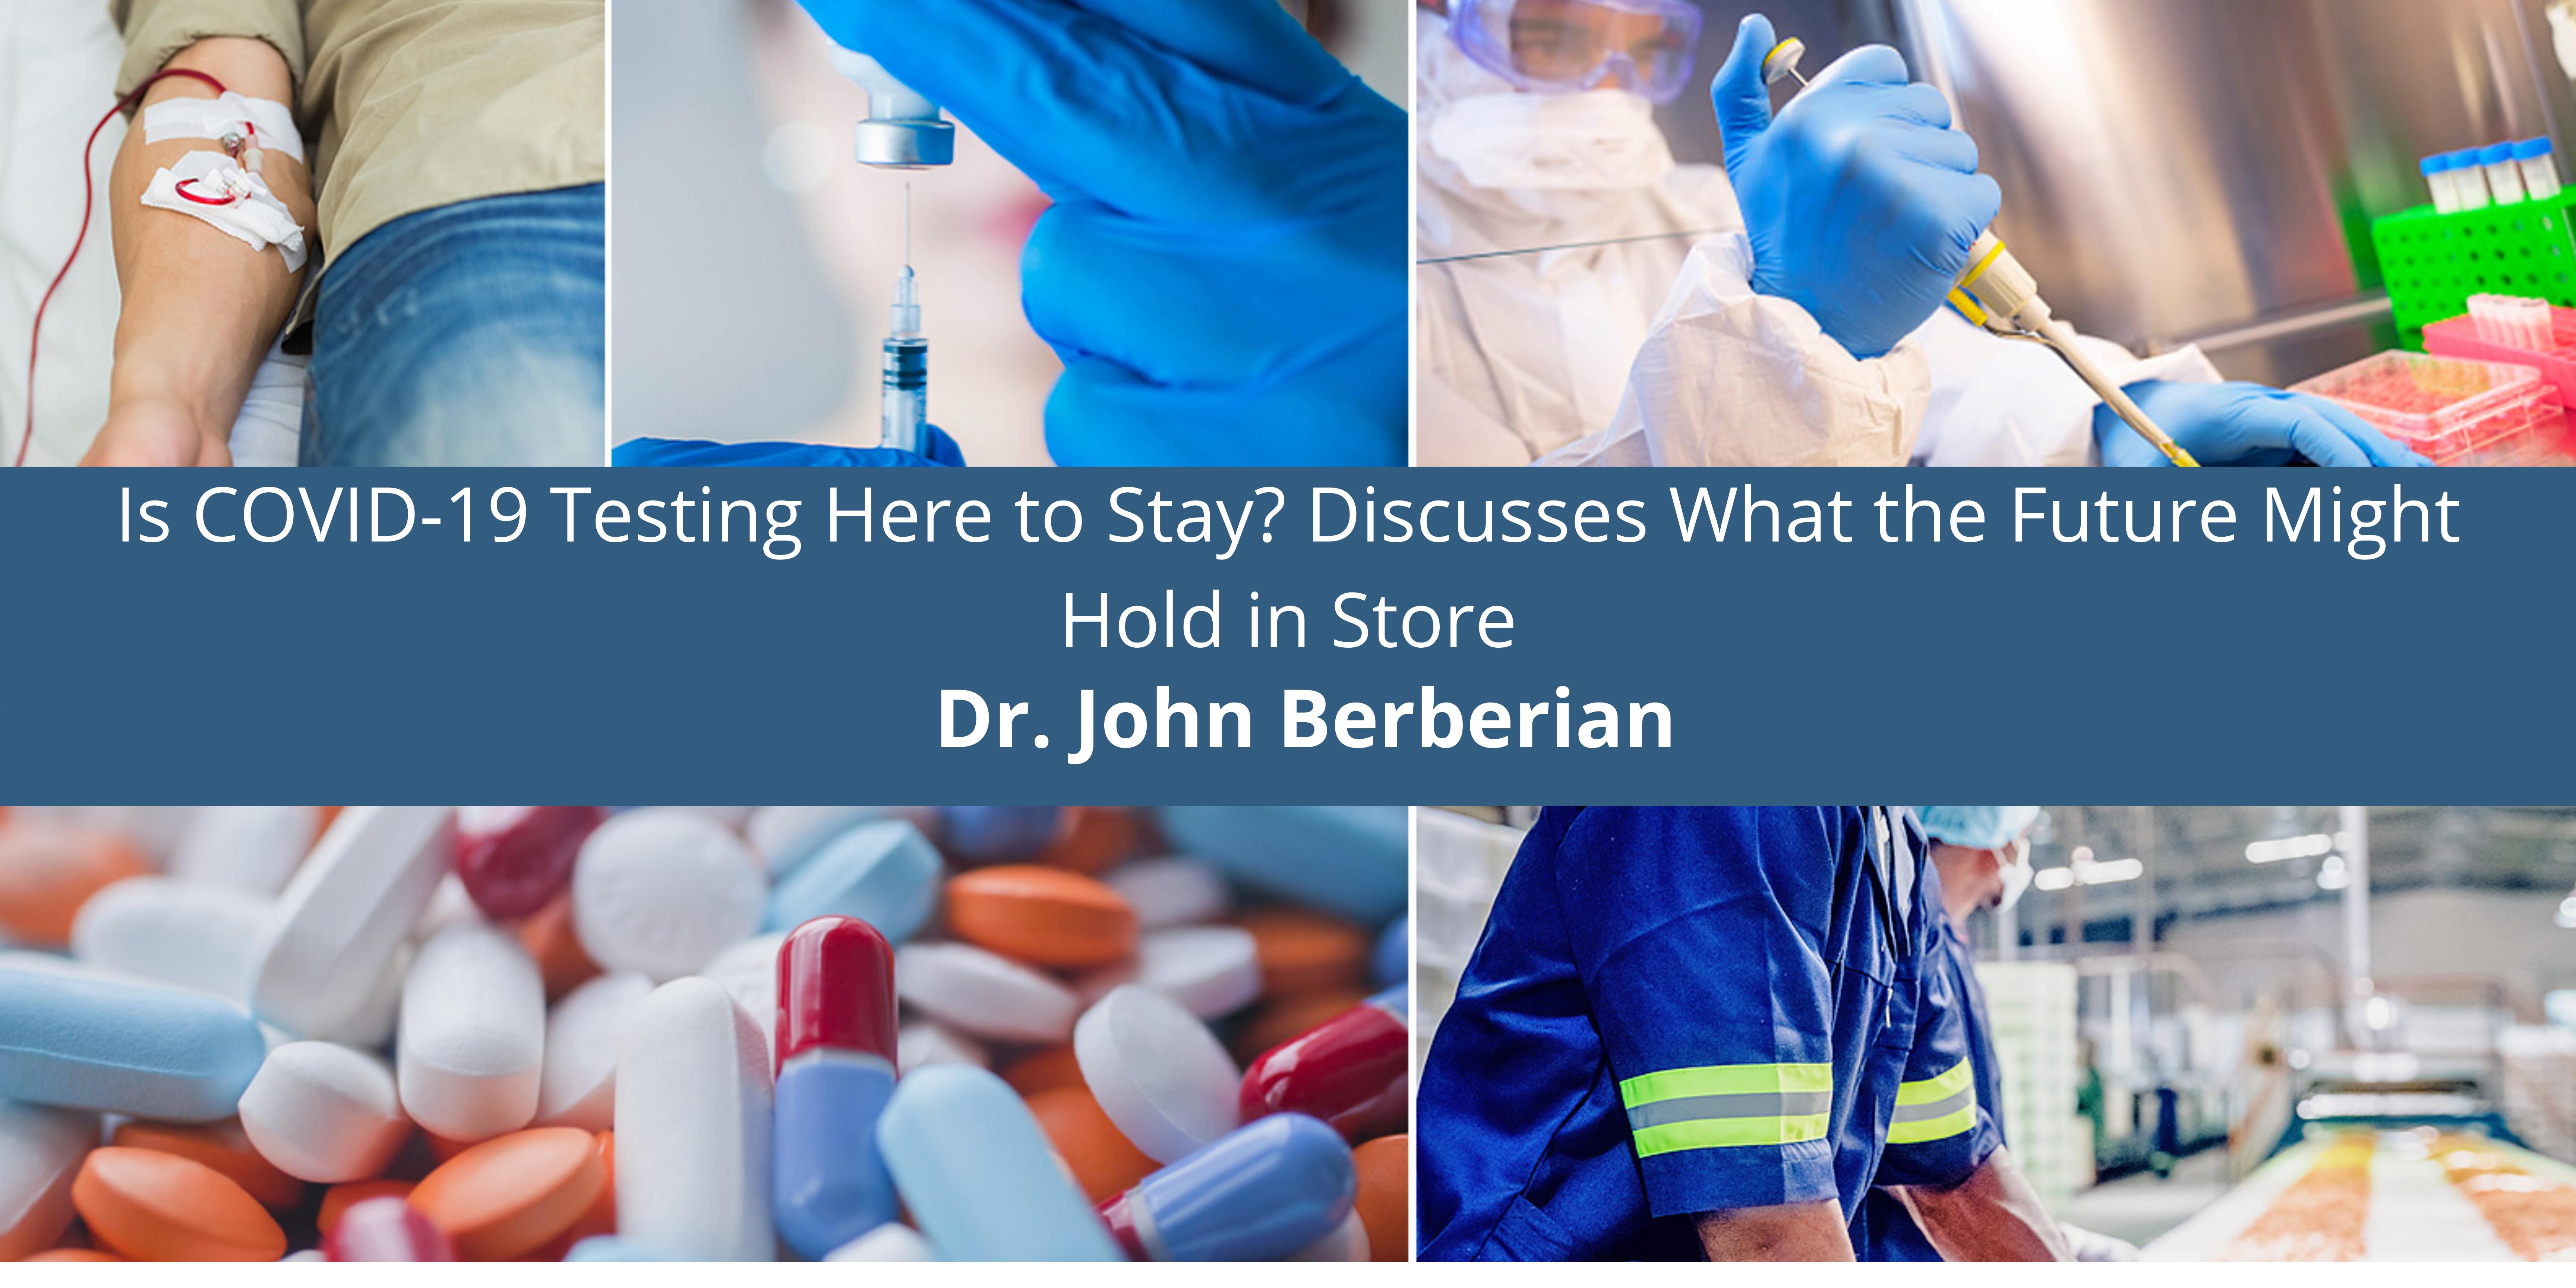 Dr. John Berberian of Atlanta Discusses What the Future Hold in Store